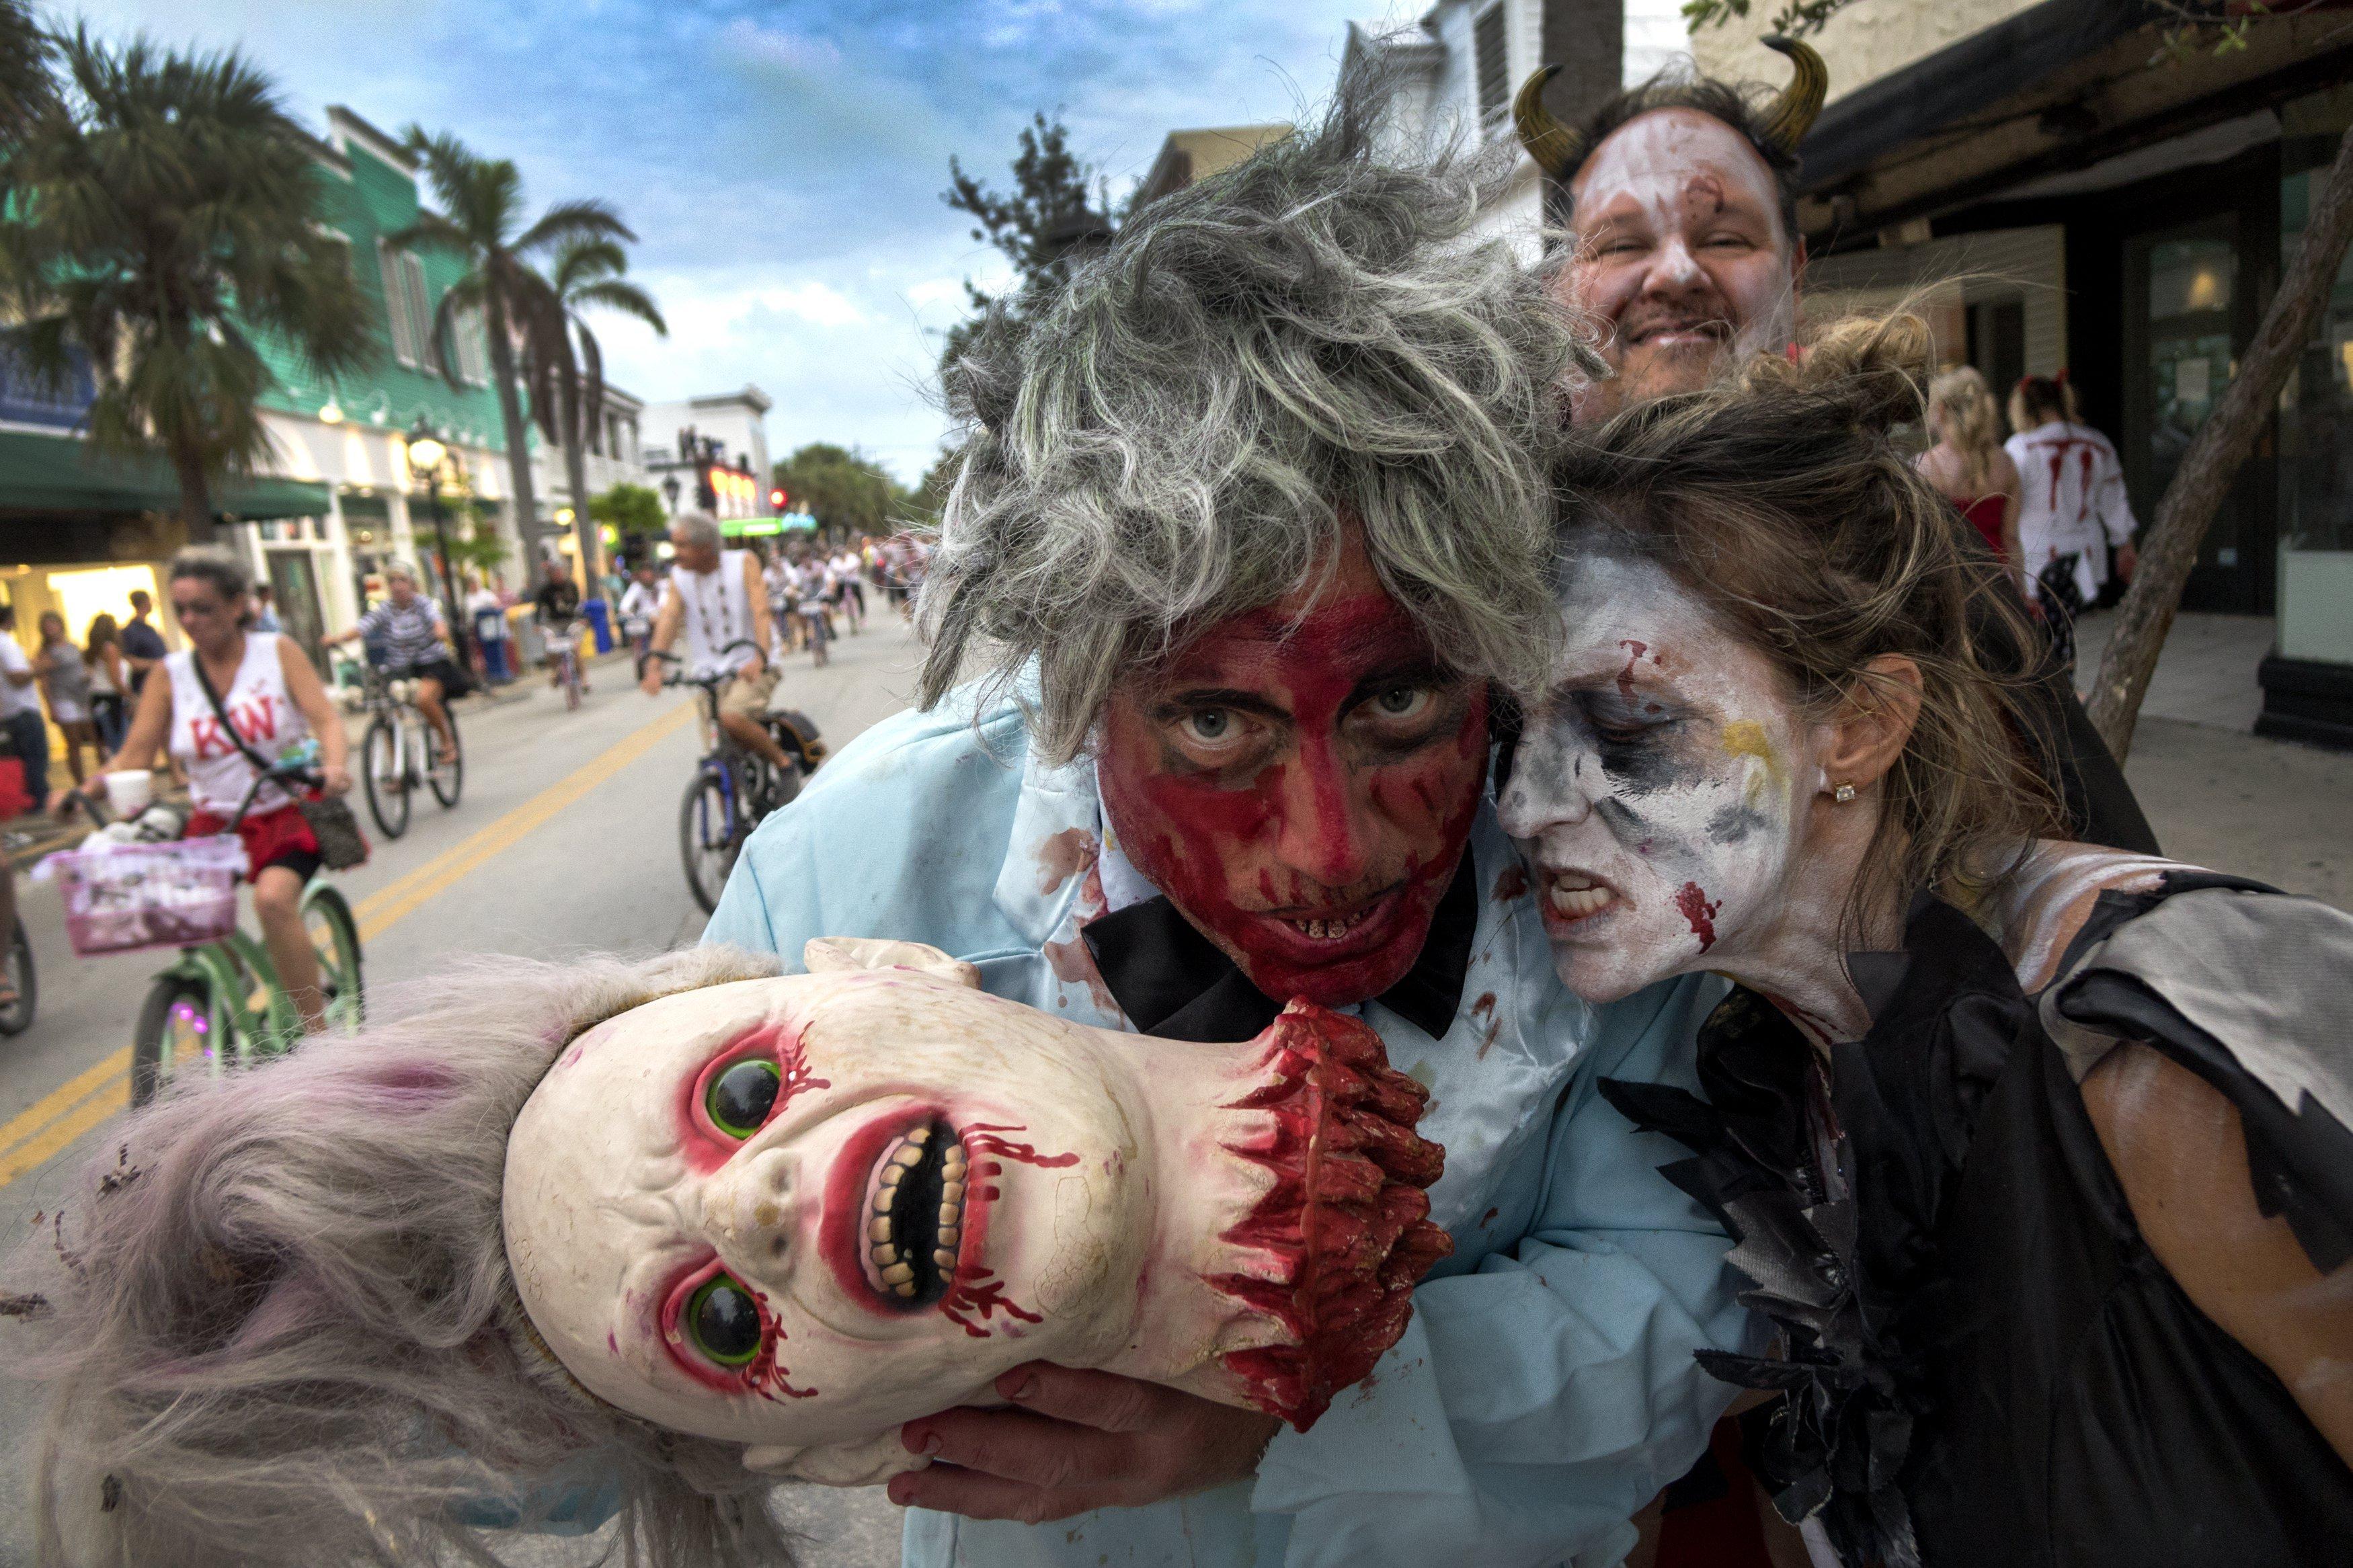 Desfilada de Fantasy Fest 2017 a Key West, Florida. /CRISTOBAL HERRERA